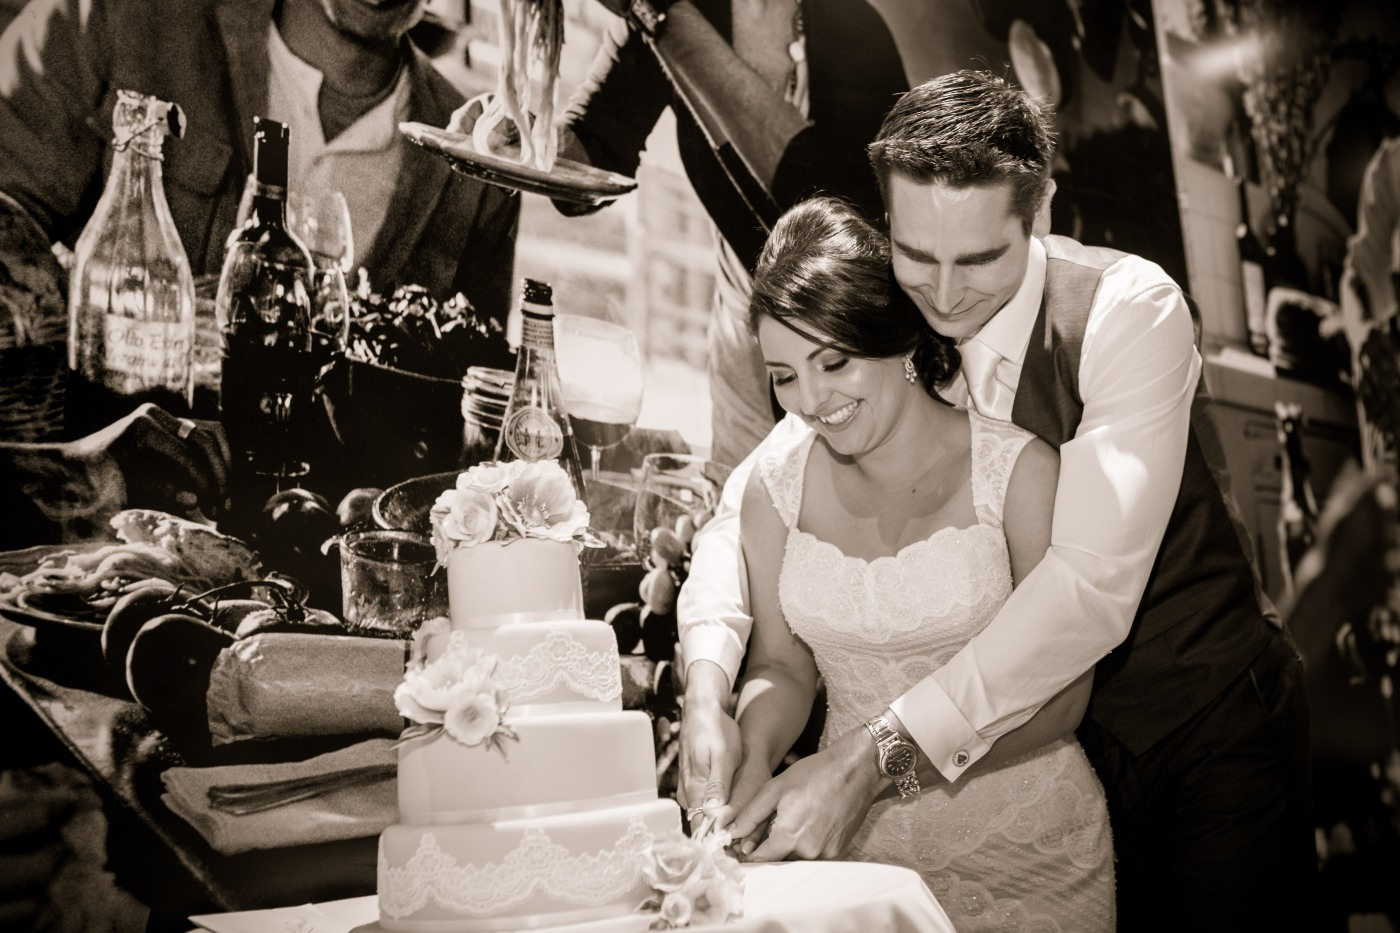 The Wedding Part 7 Reception Annaliese Maree - Godfather Wedding Cake